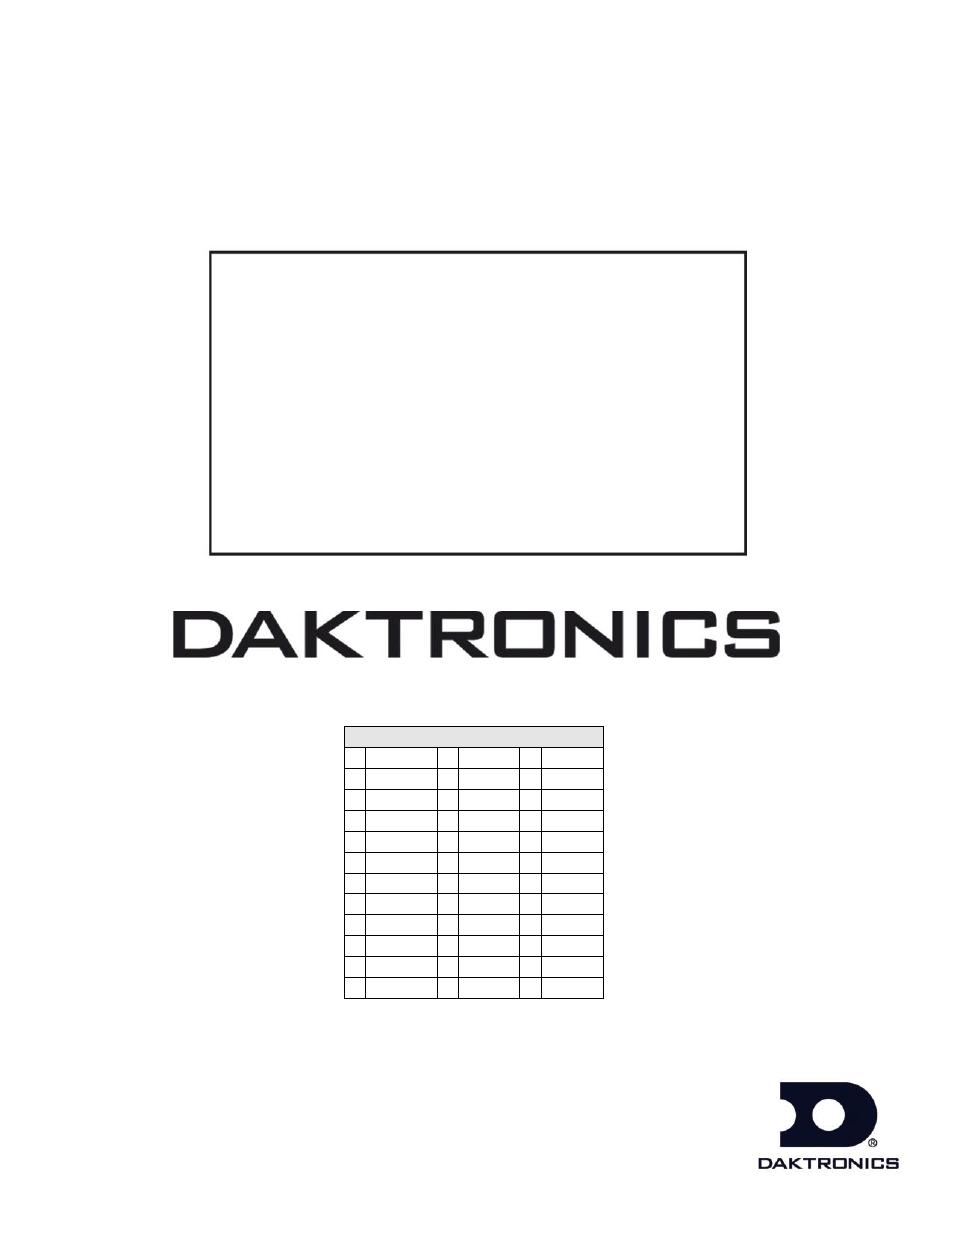 Daktronics BB-2101 Tuff Sport Basketball LED Scoreboard